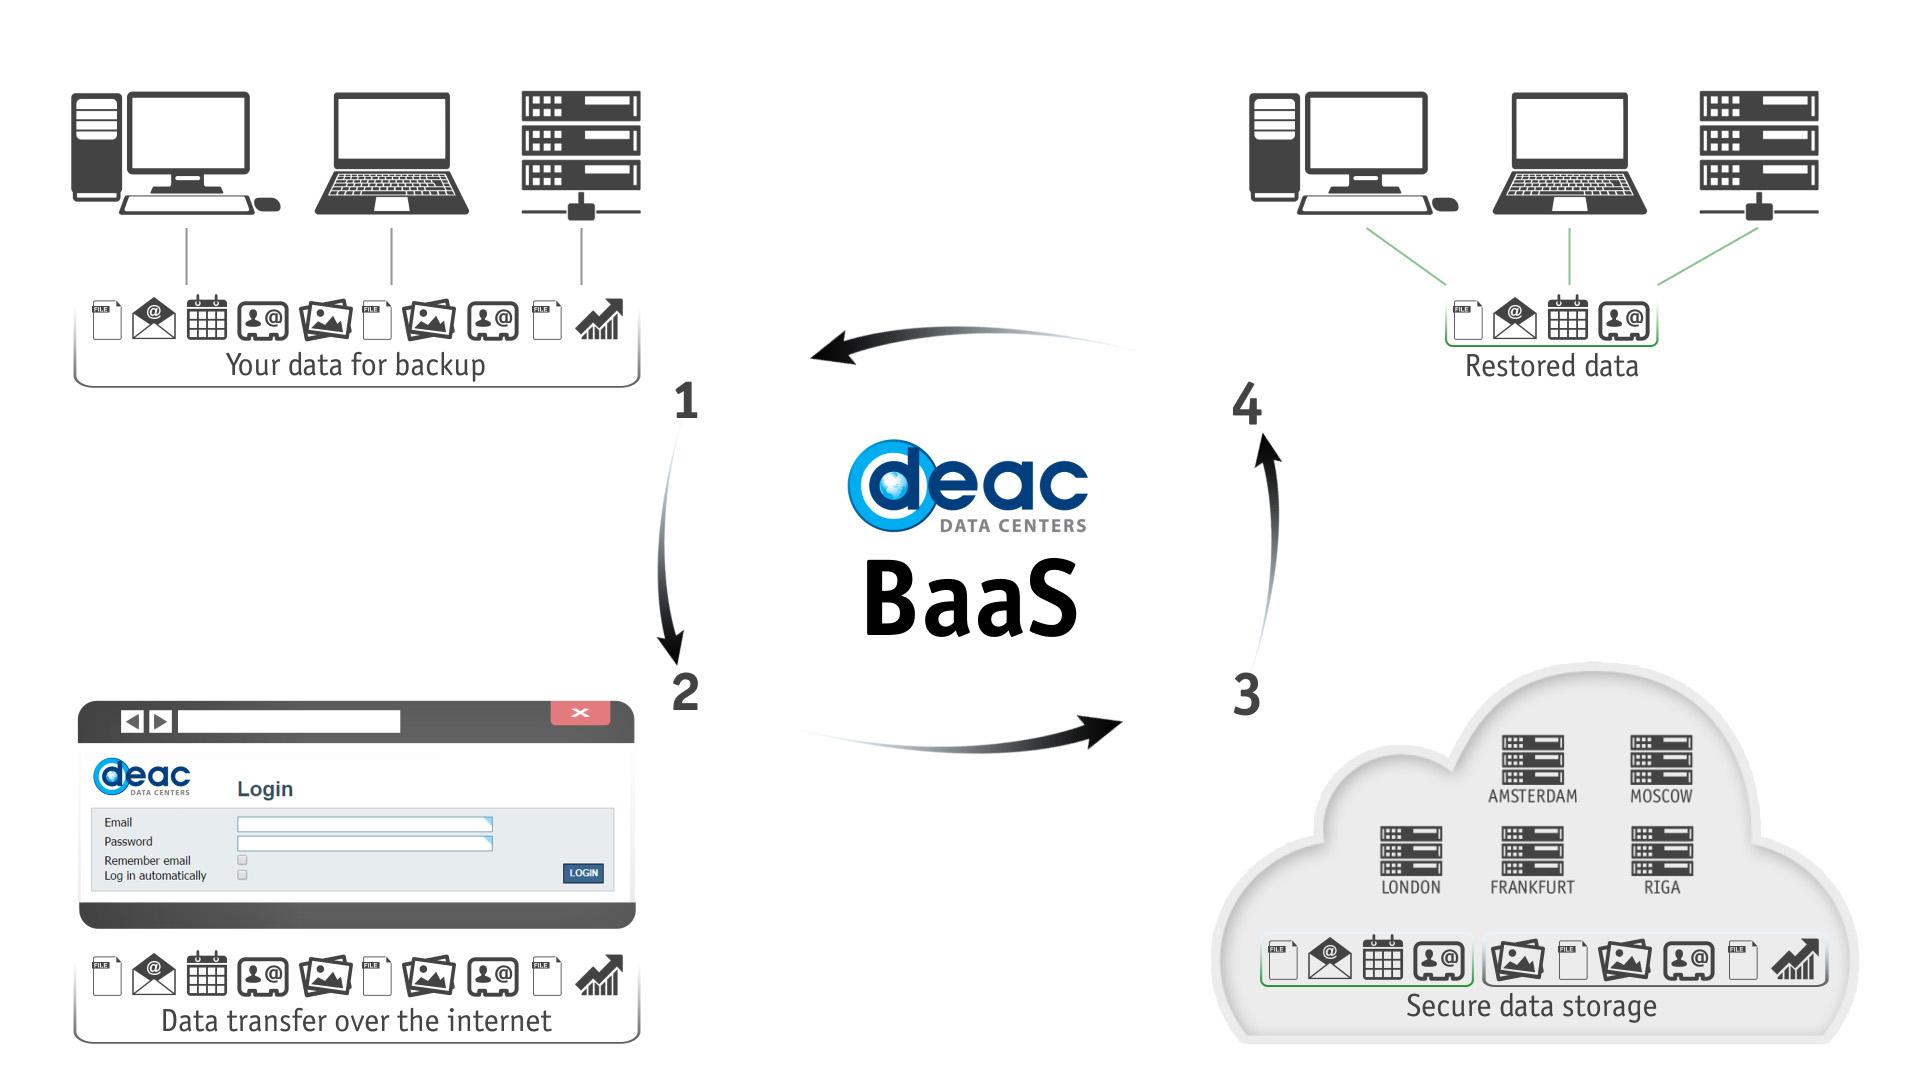 Data backup BaaS DEAC